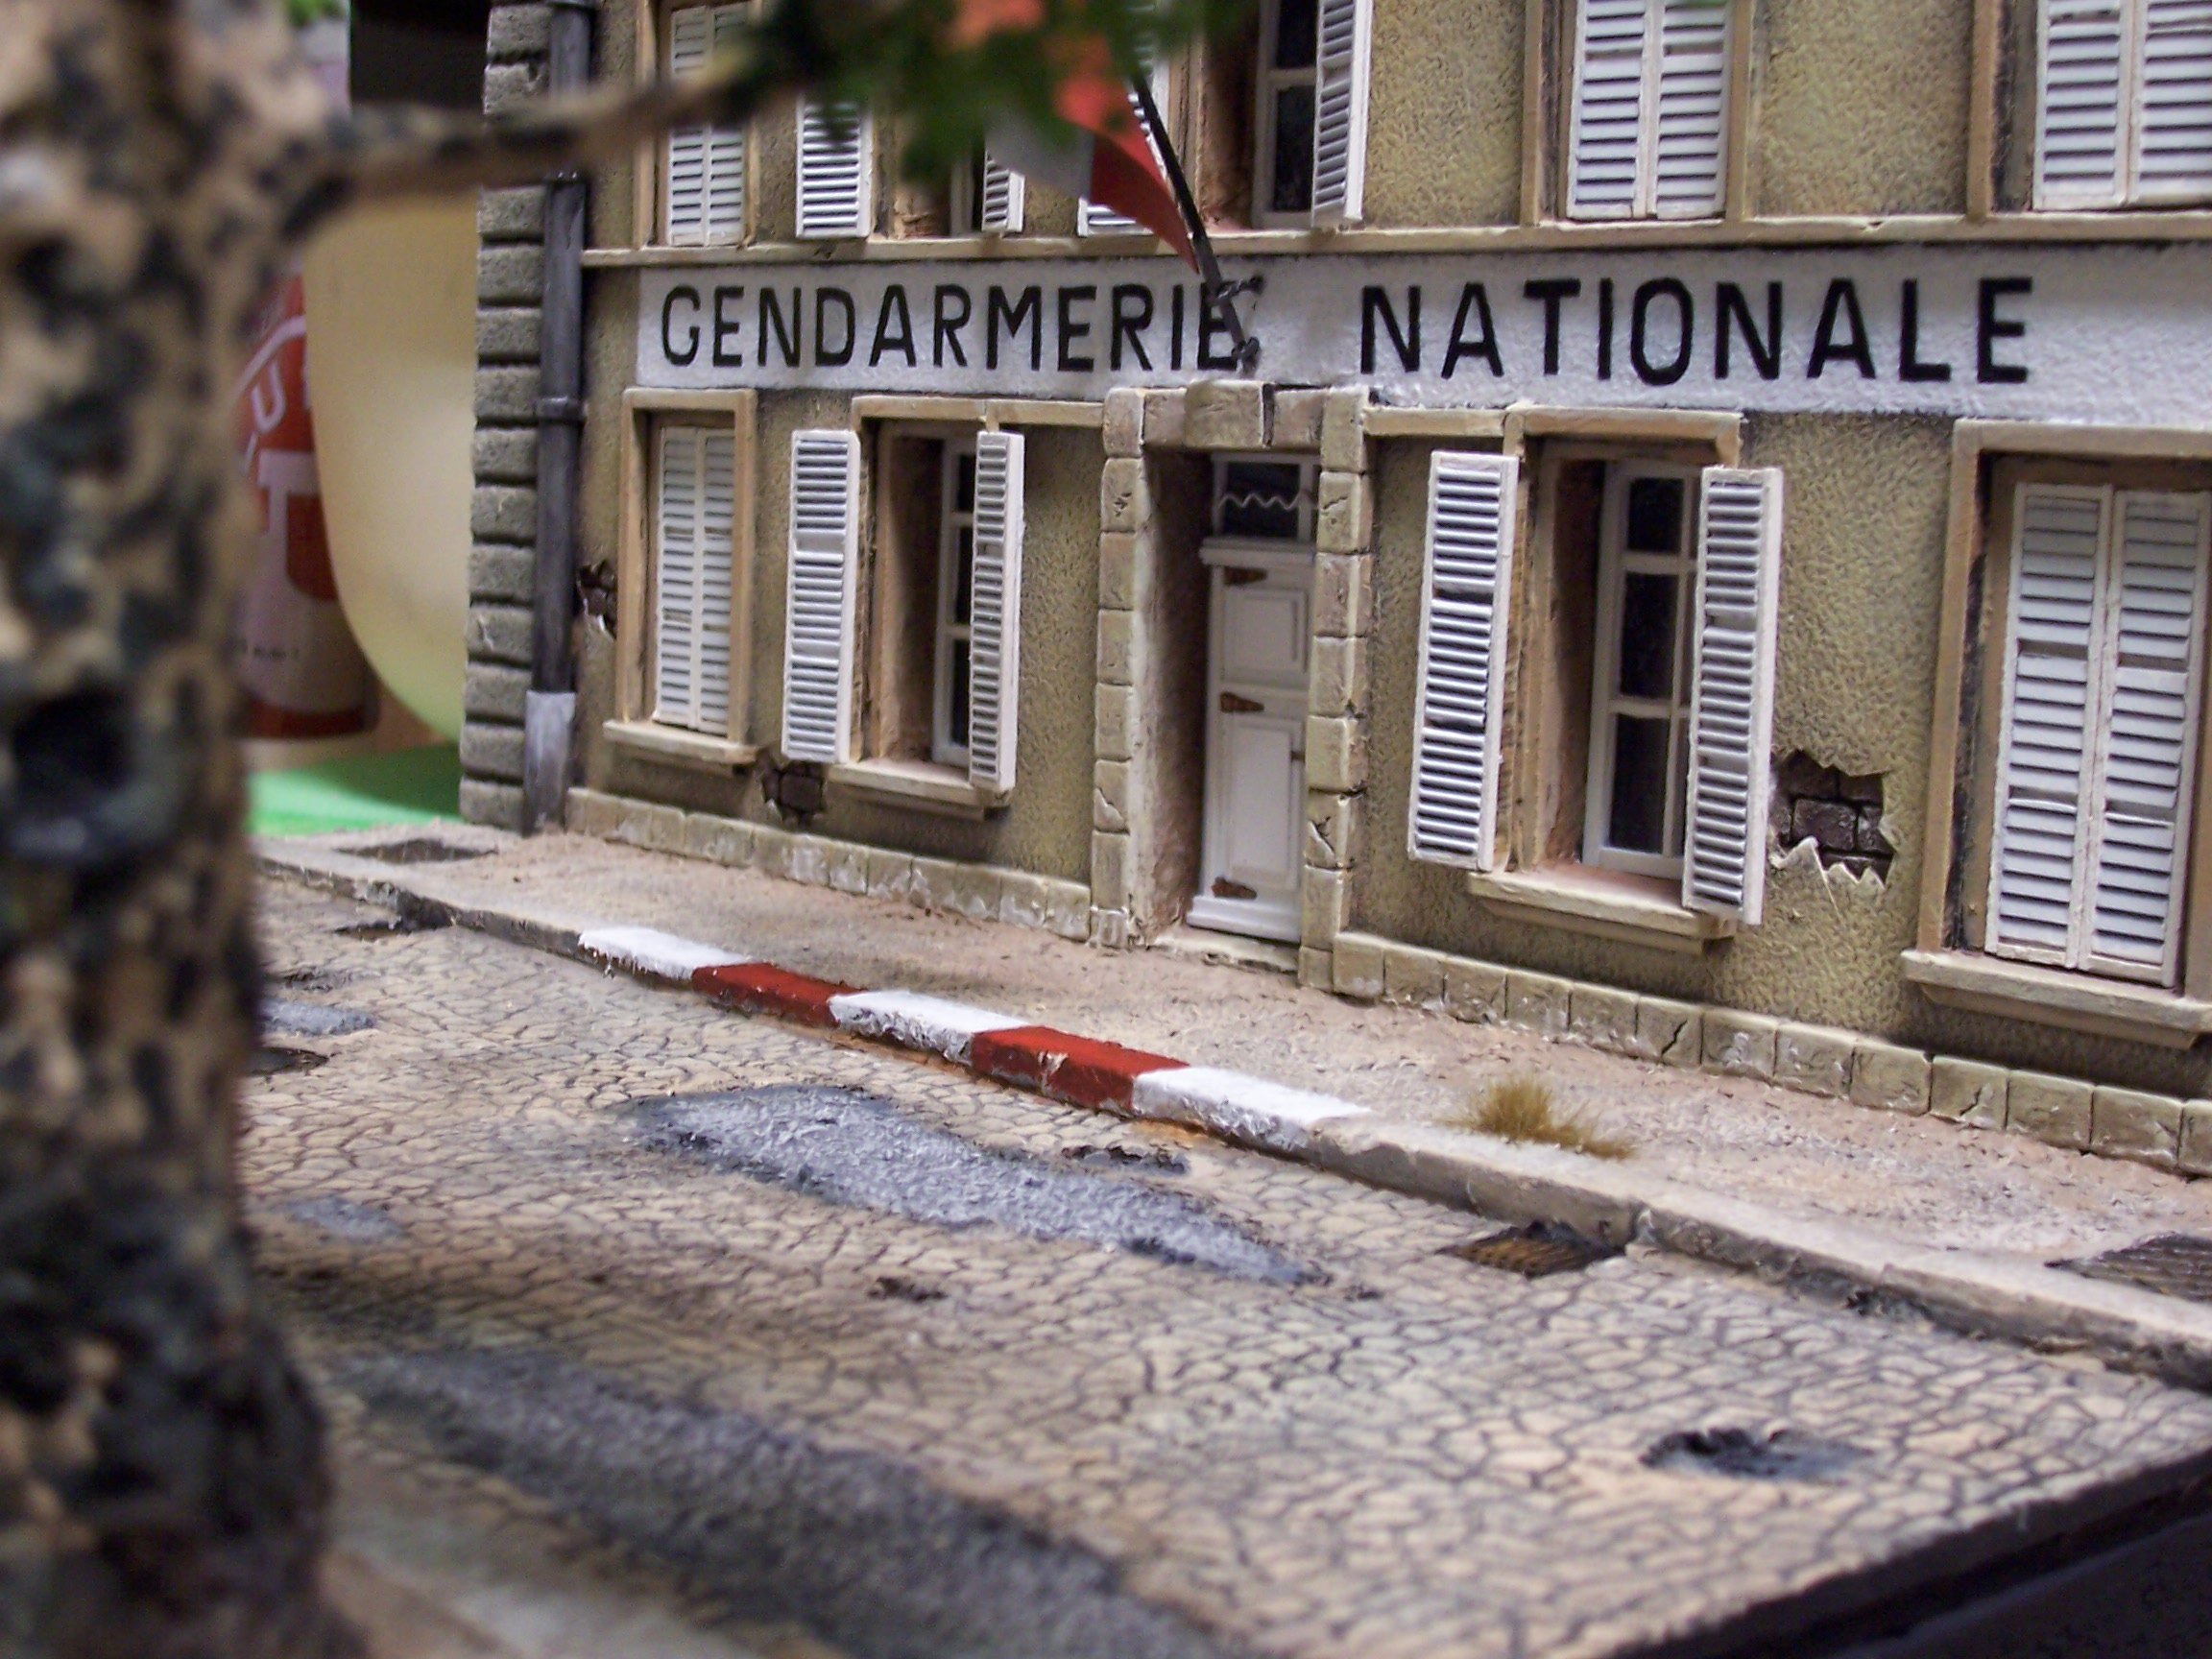 coolminiornot gendarmerie nationale st tropez louis de funes by scarface. Black Bedroom Furniture Sets. Home Design Ideas